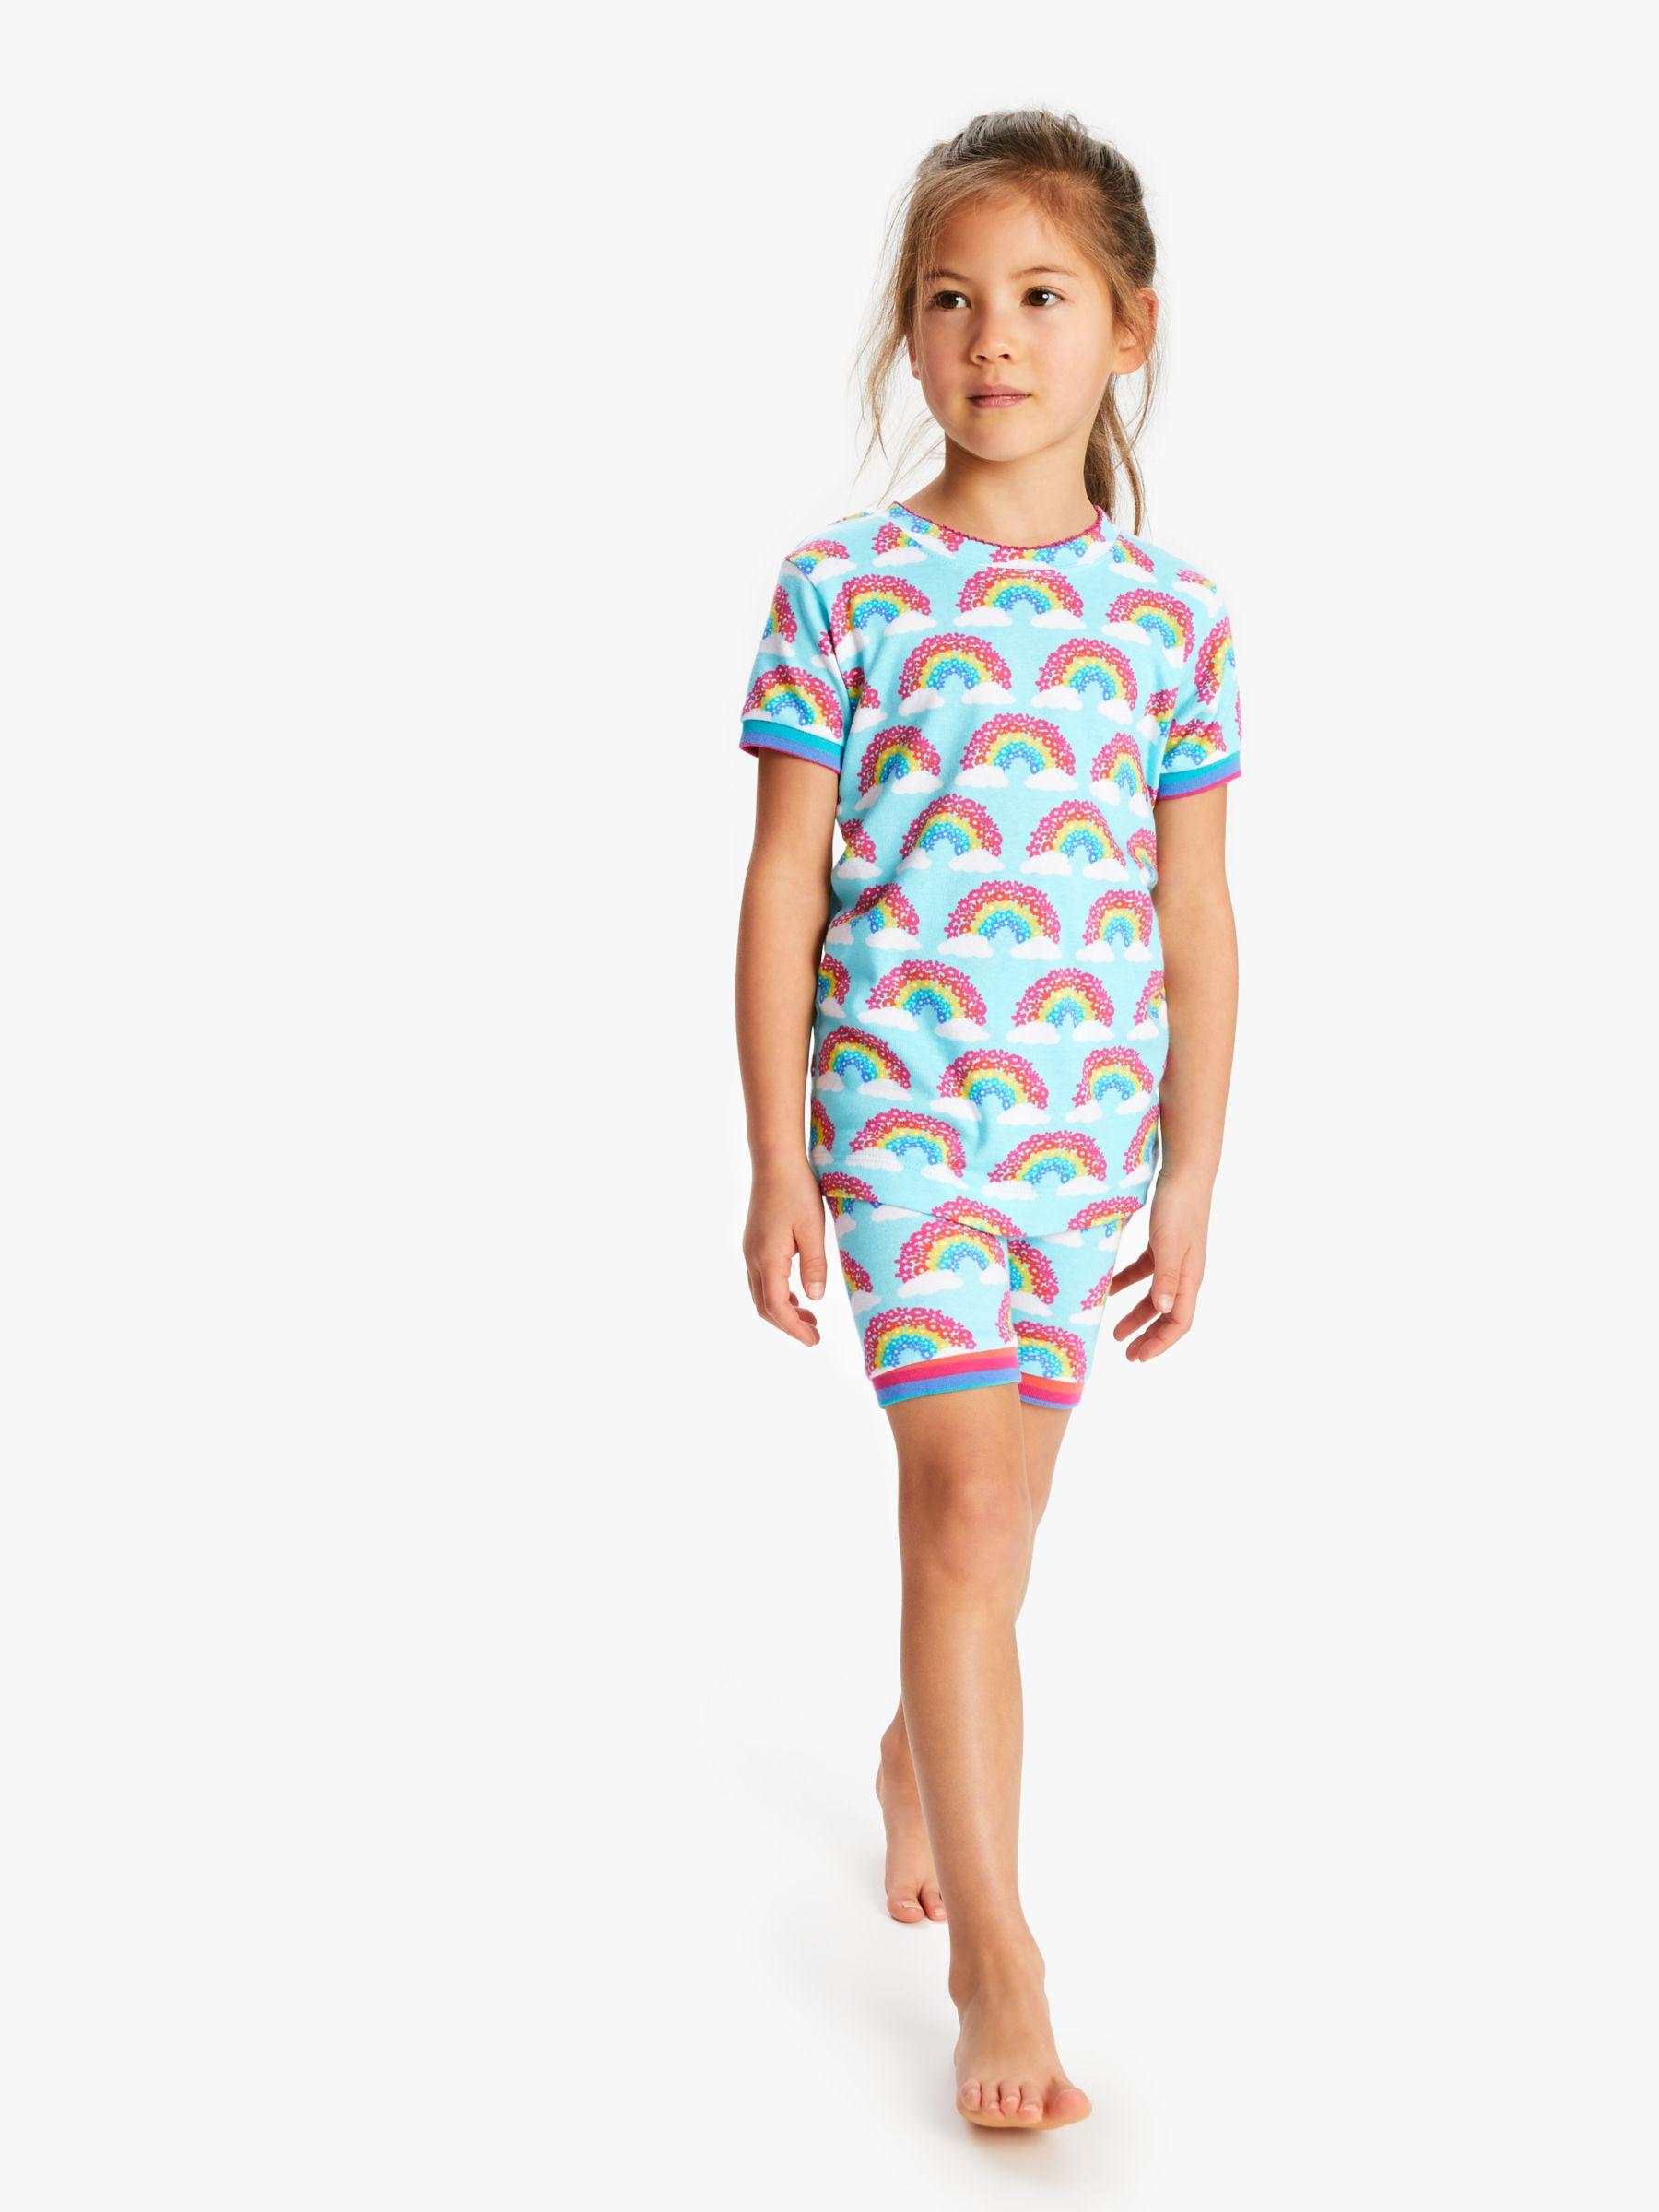 Hatley Hatley Girls' Rainbow Print Short Pyjamas, Blue